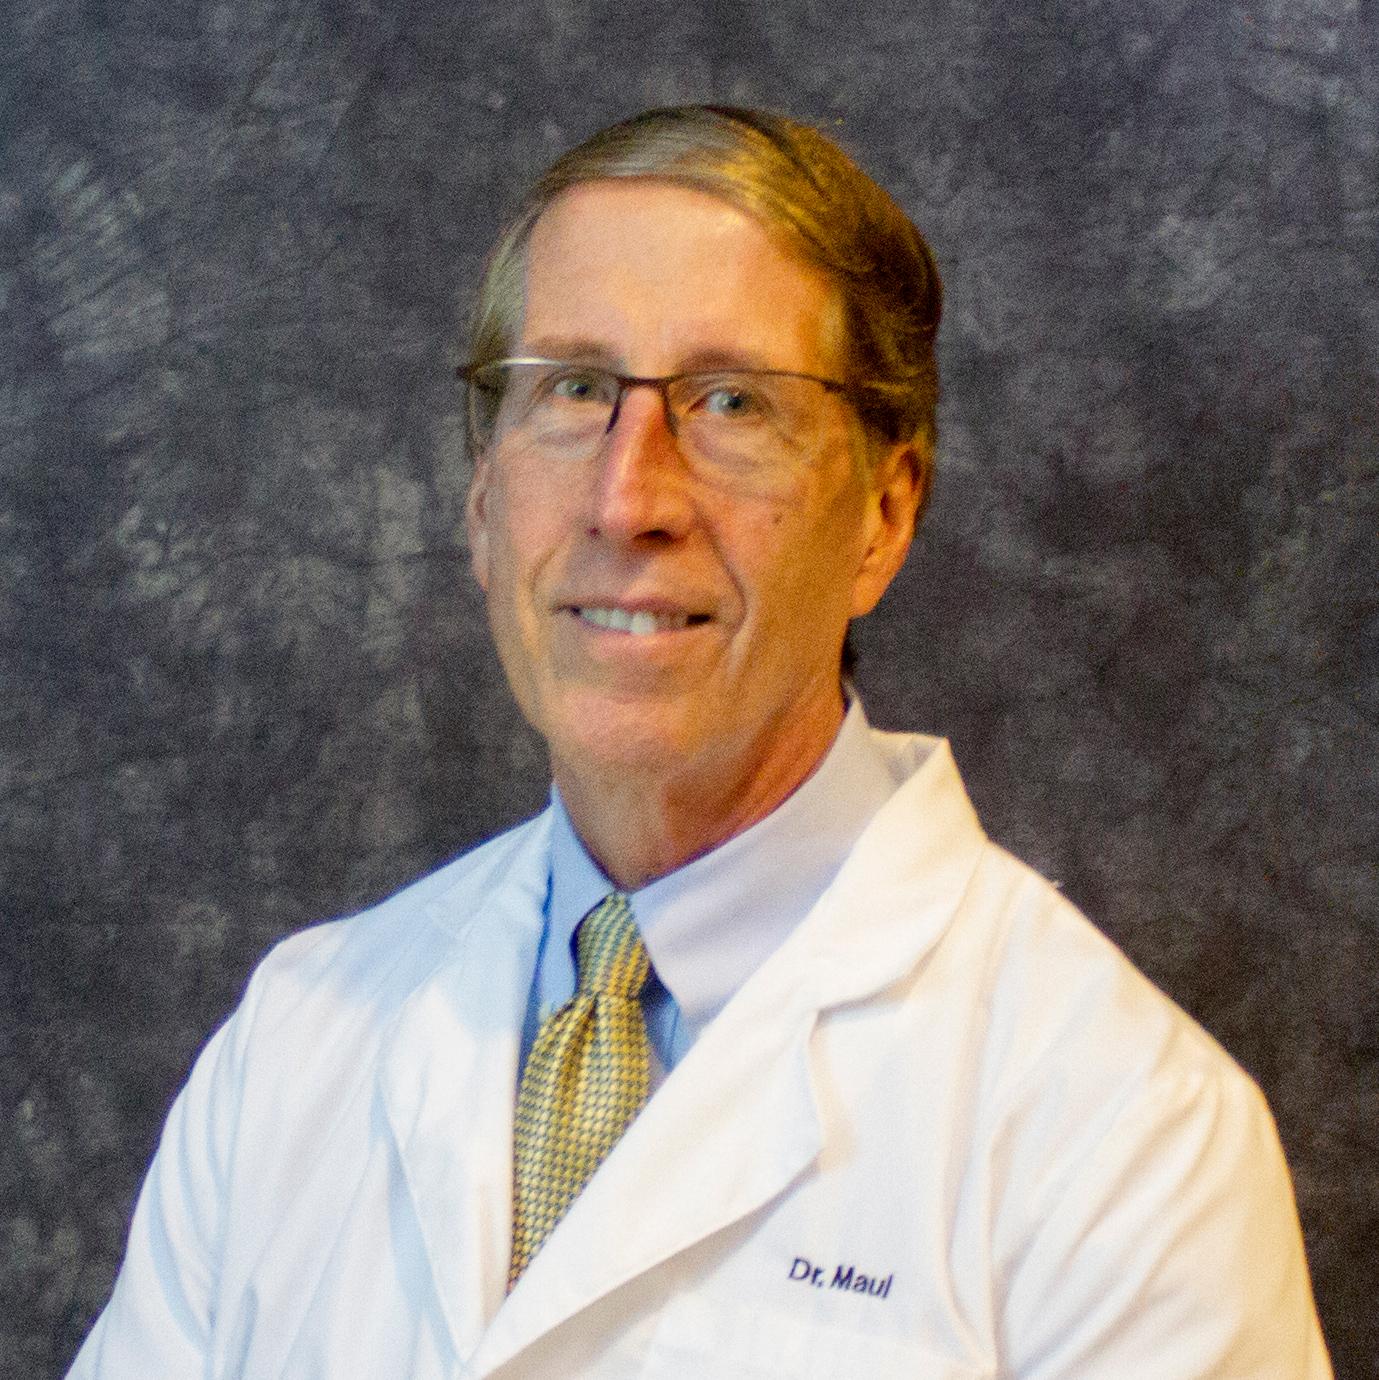 James Maul, OD Optician